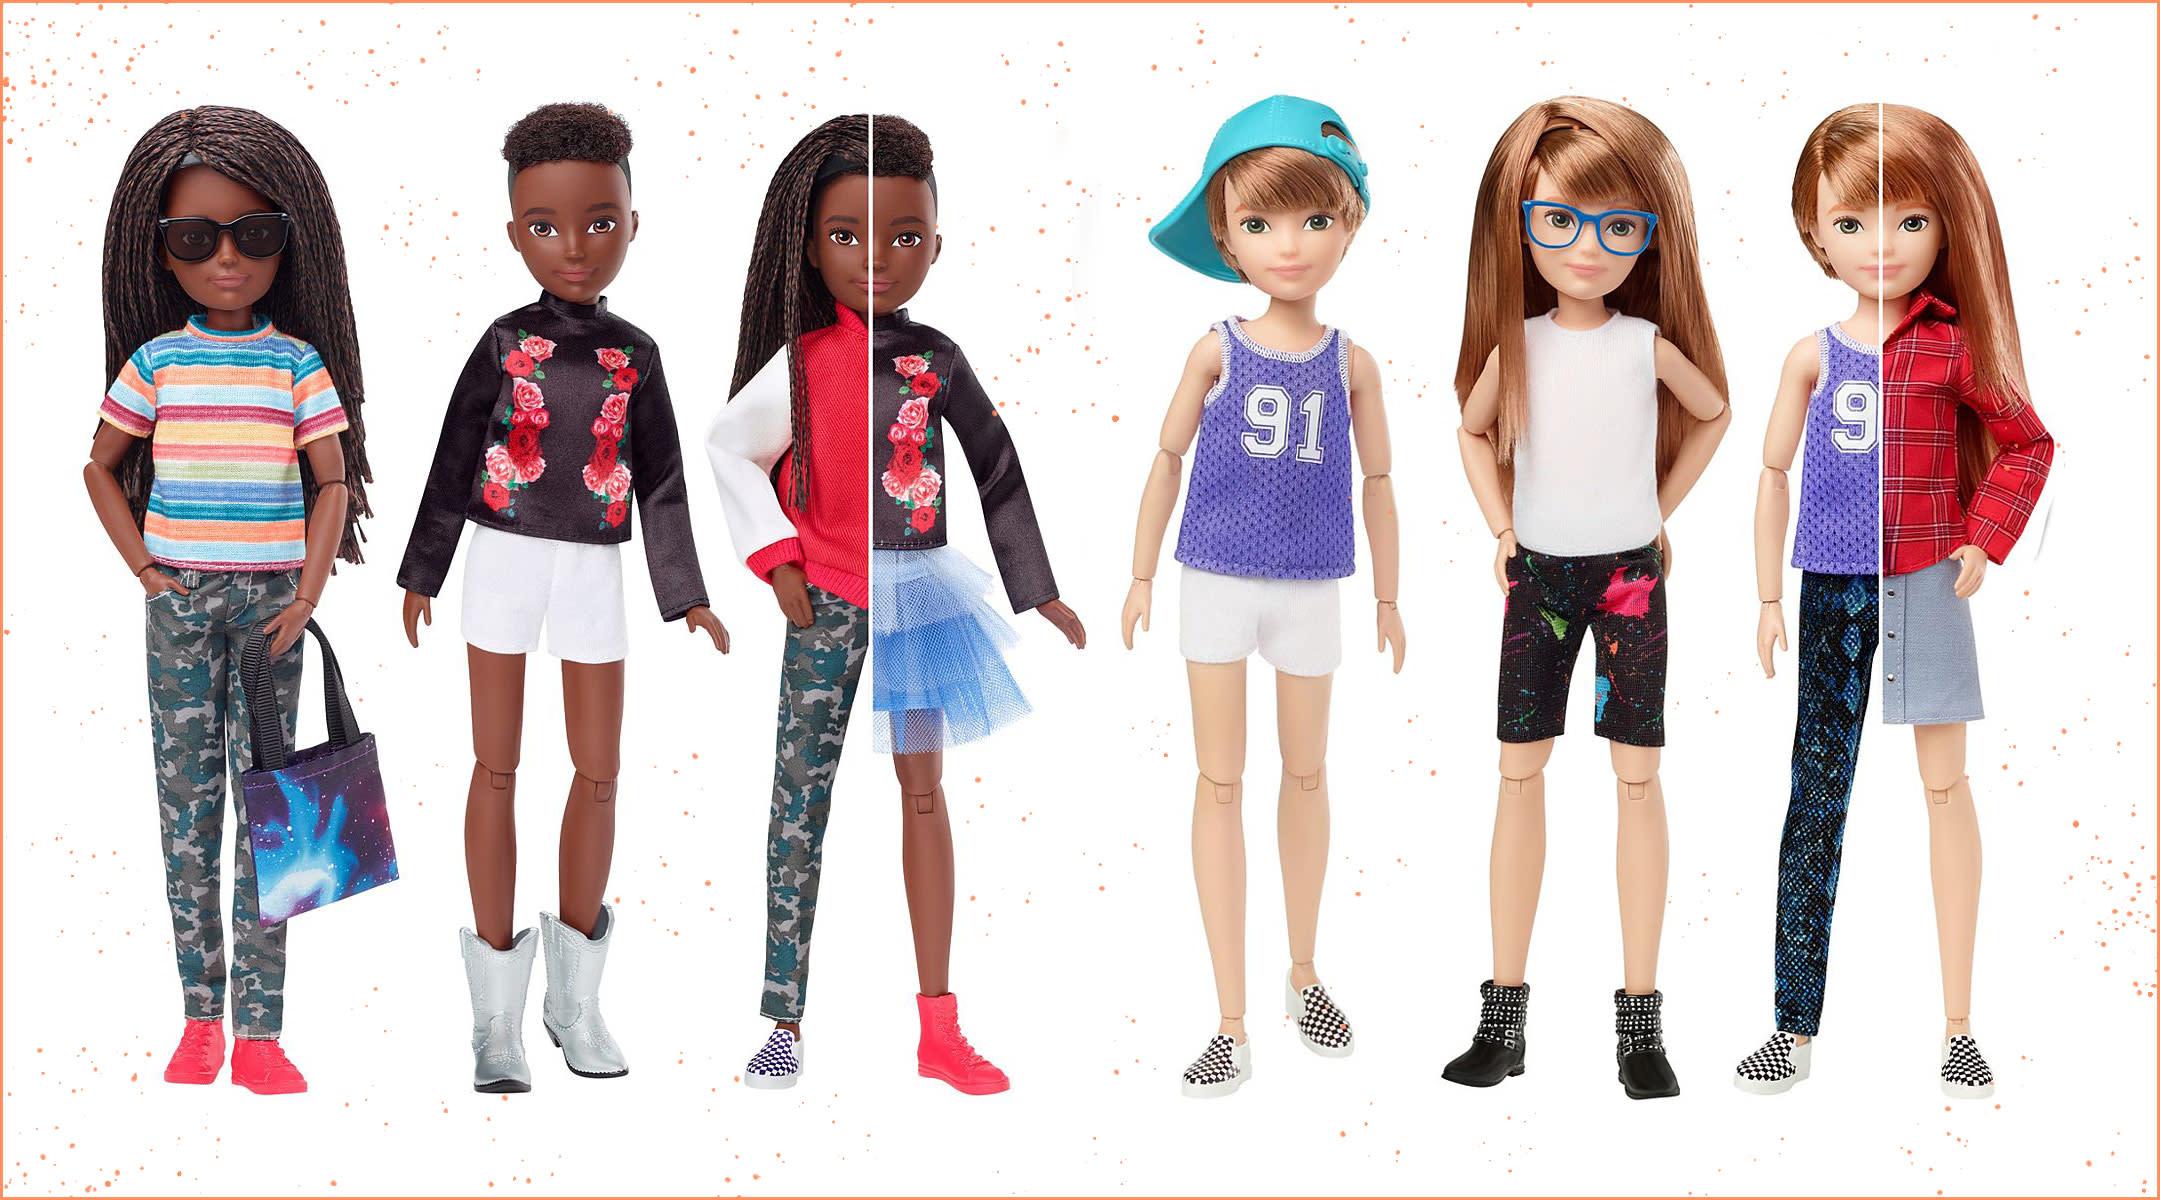 A New Mattel Line of Gender-Neutral Dolls Just Hit Stores Shelves